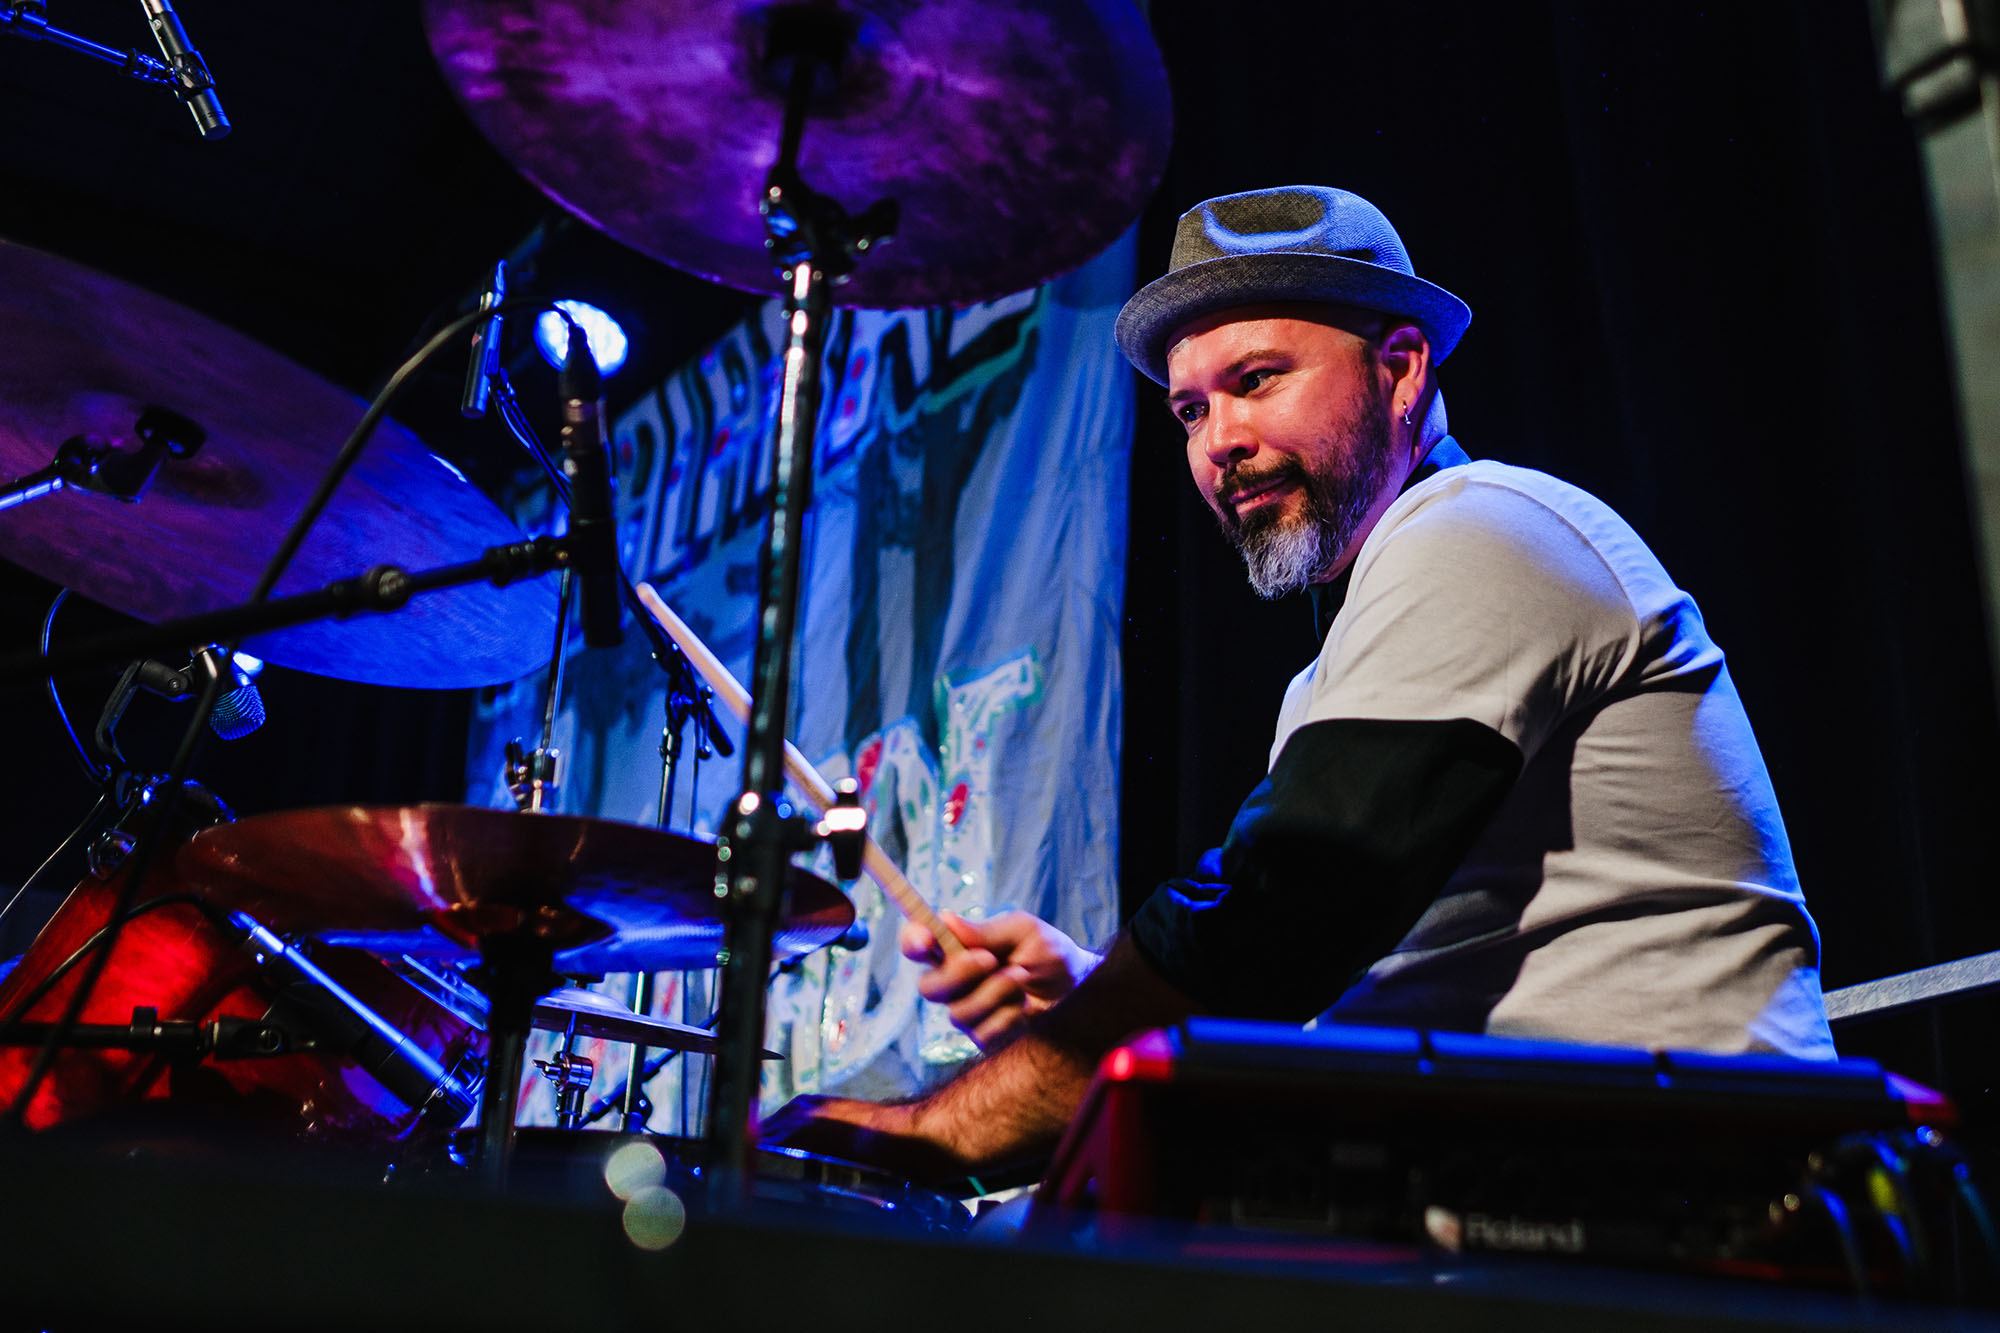 Vinx and the groove heroes, Lee Payne, Adam Bowman